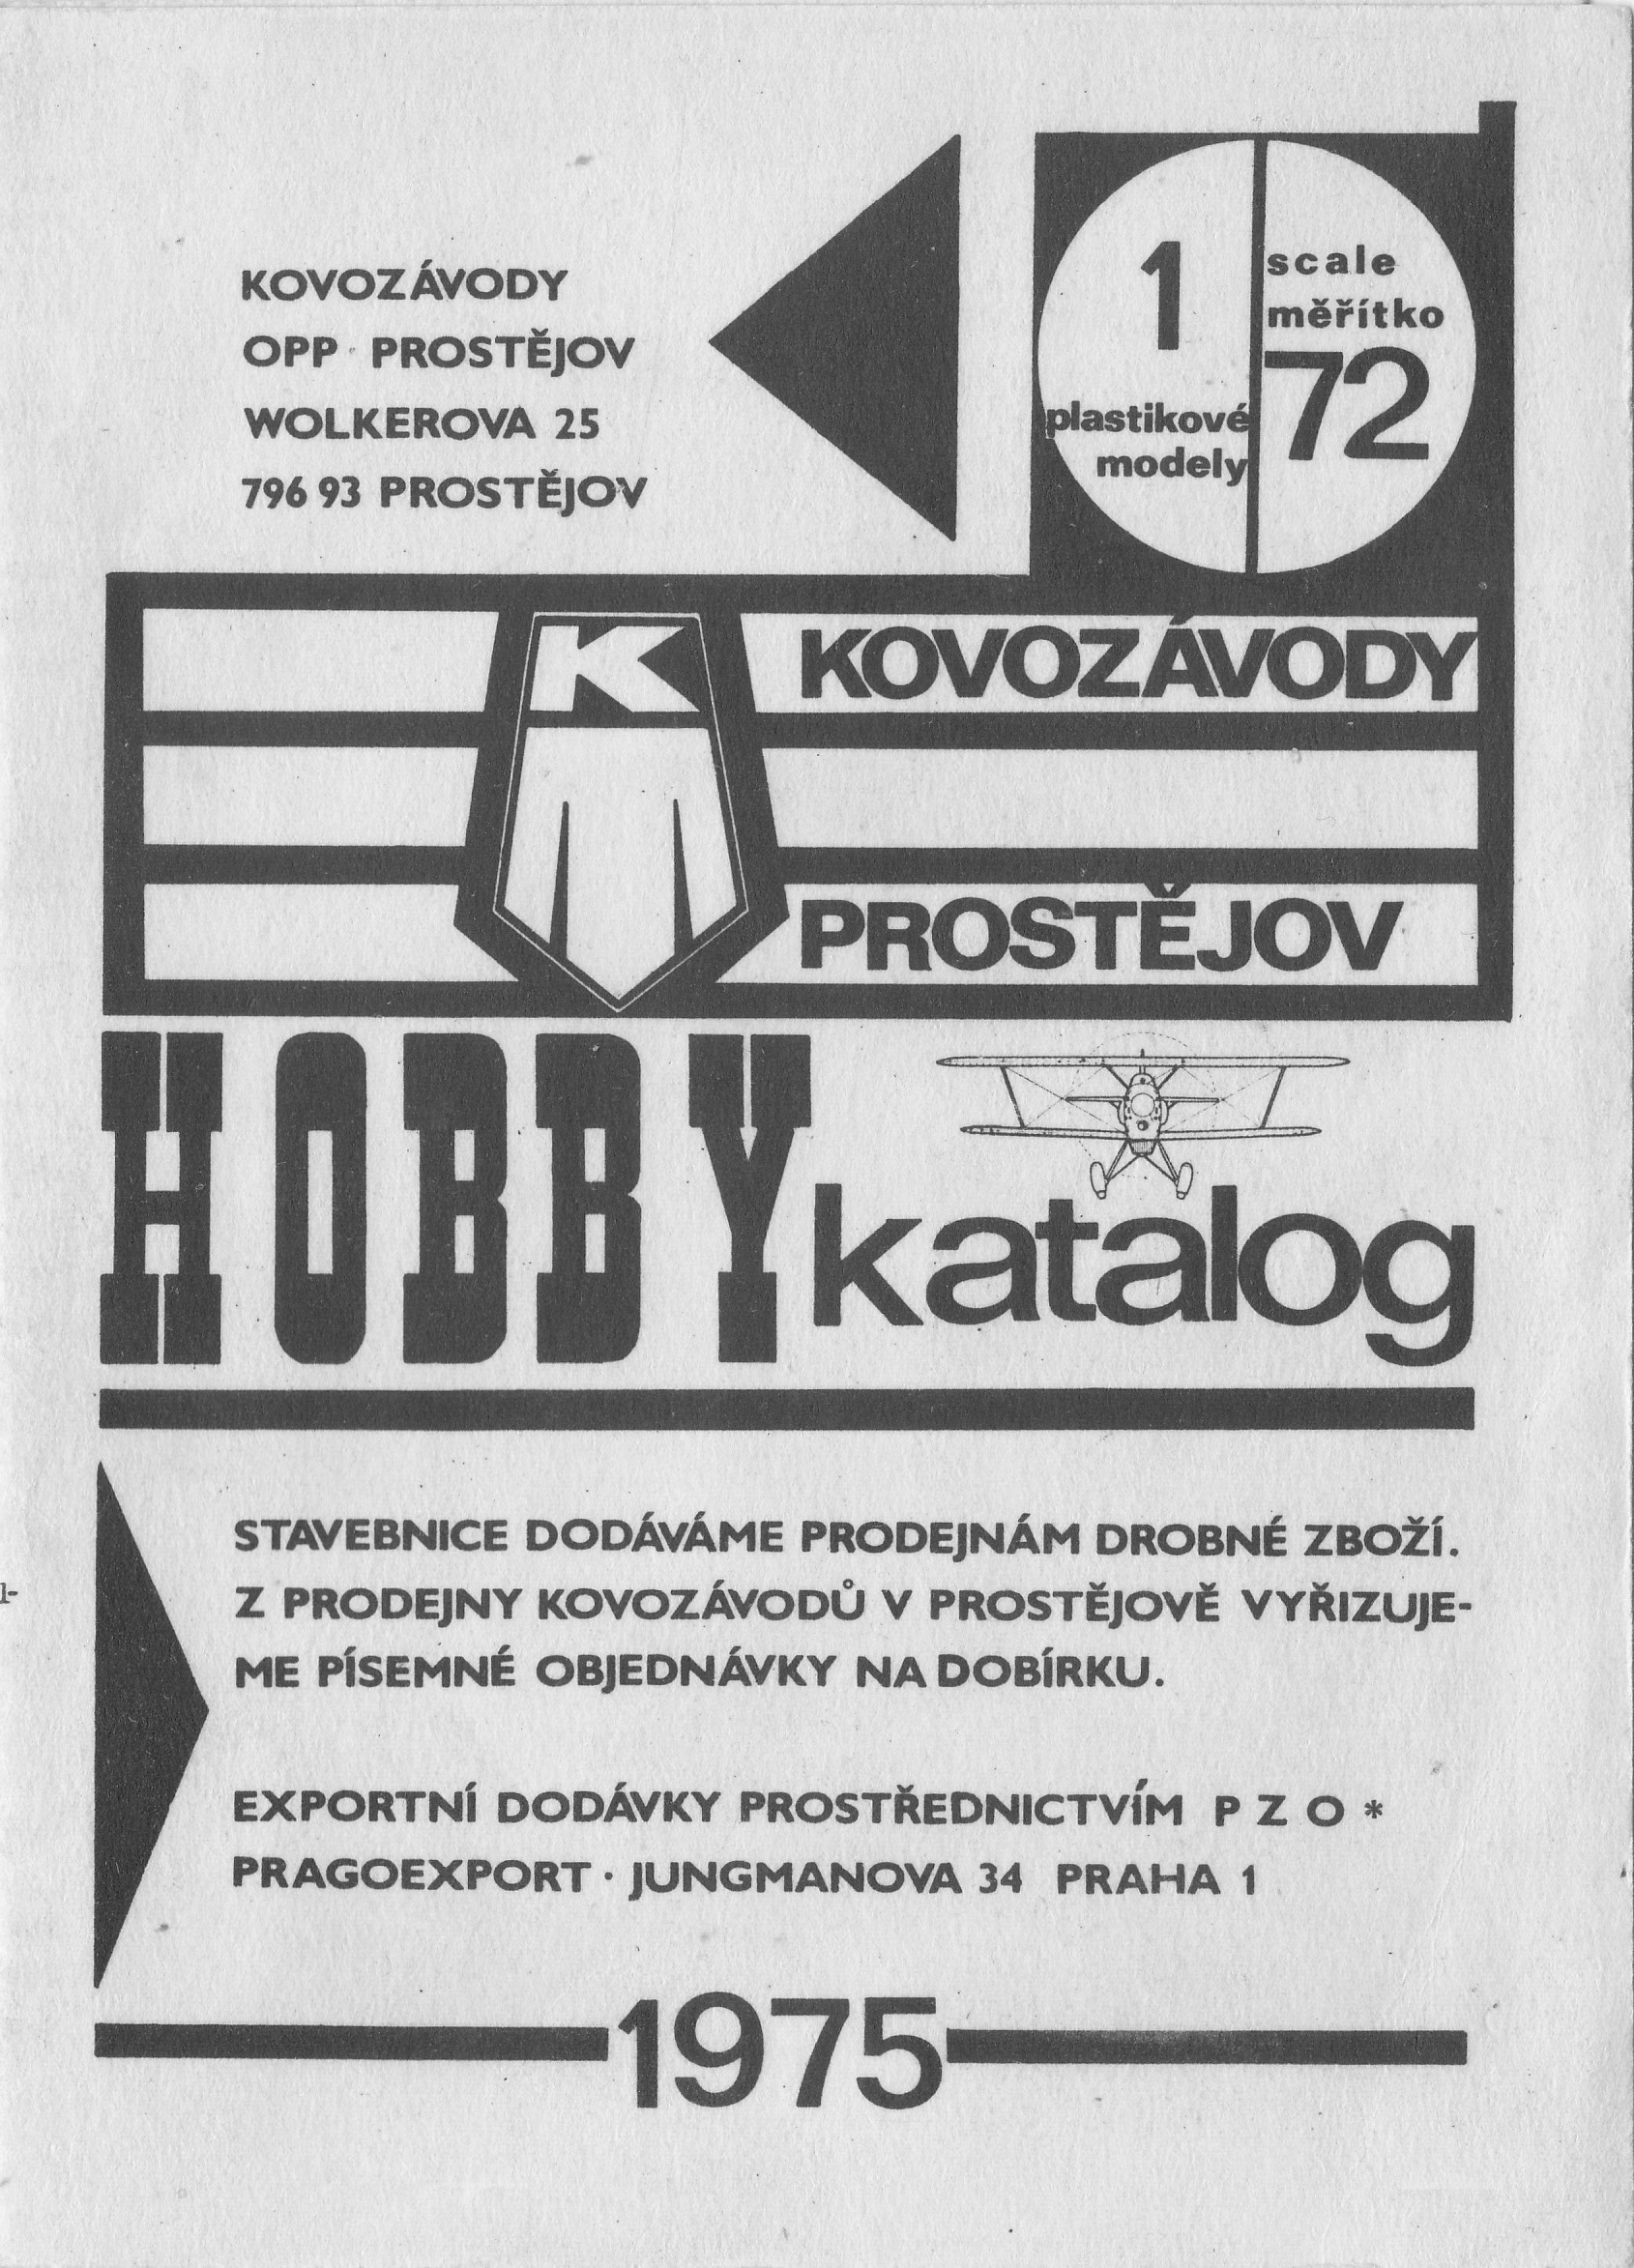 Katalog Kovozávody Prostějov 1975